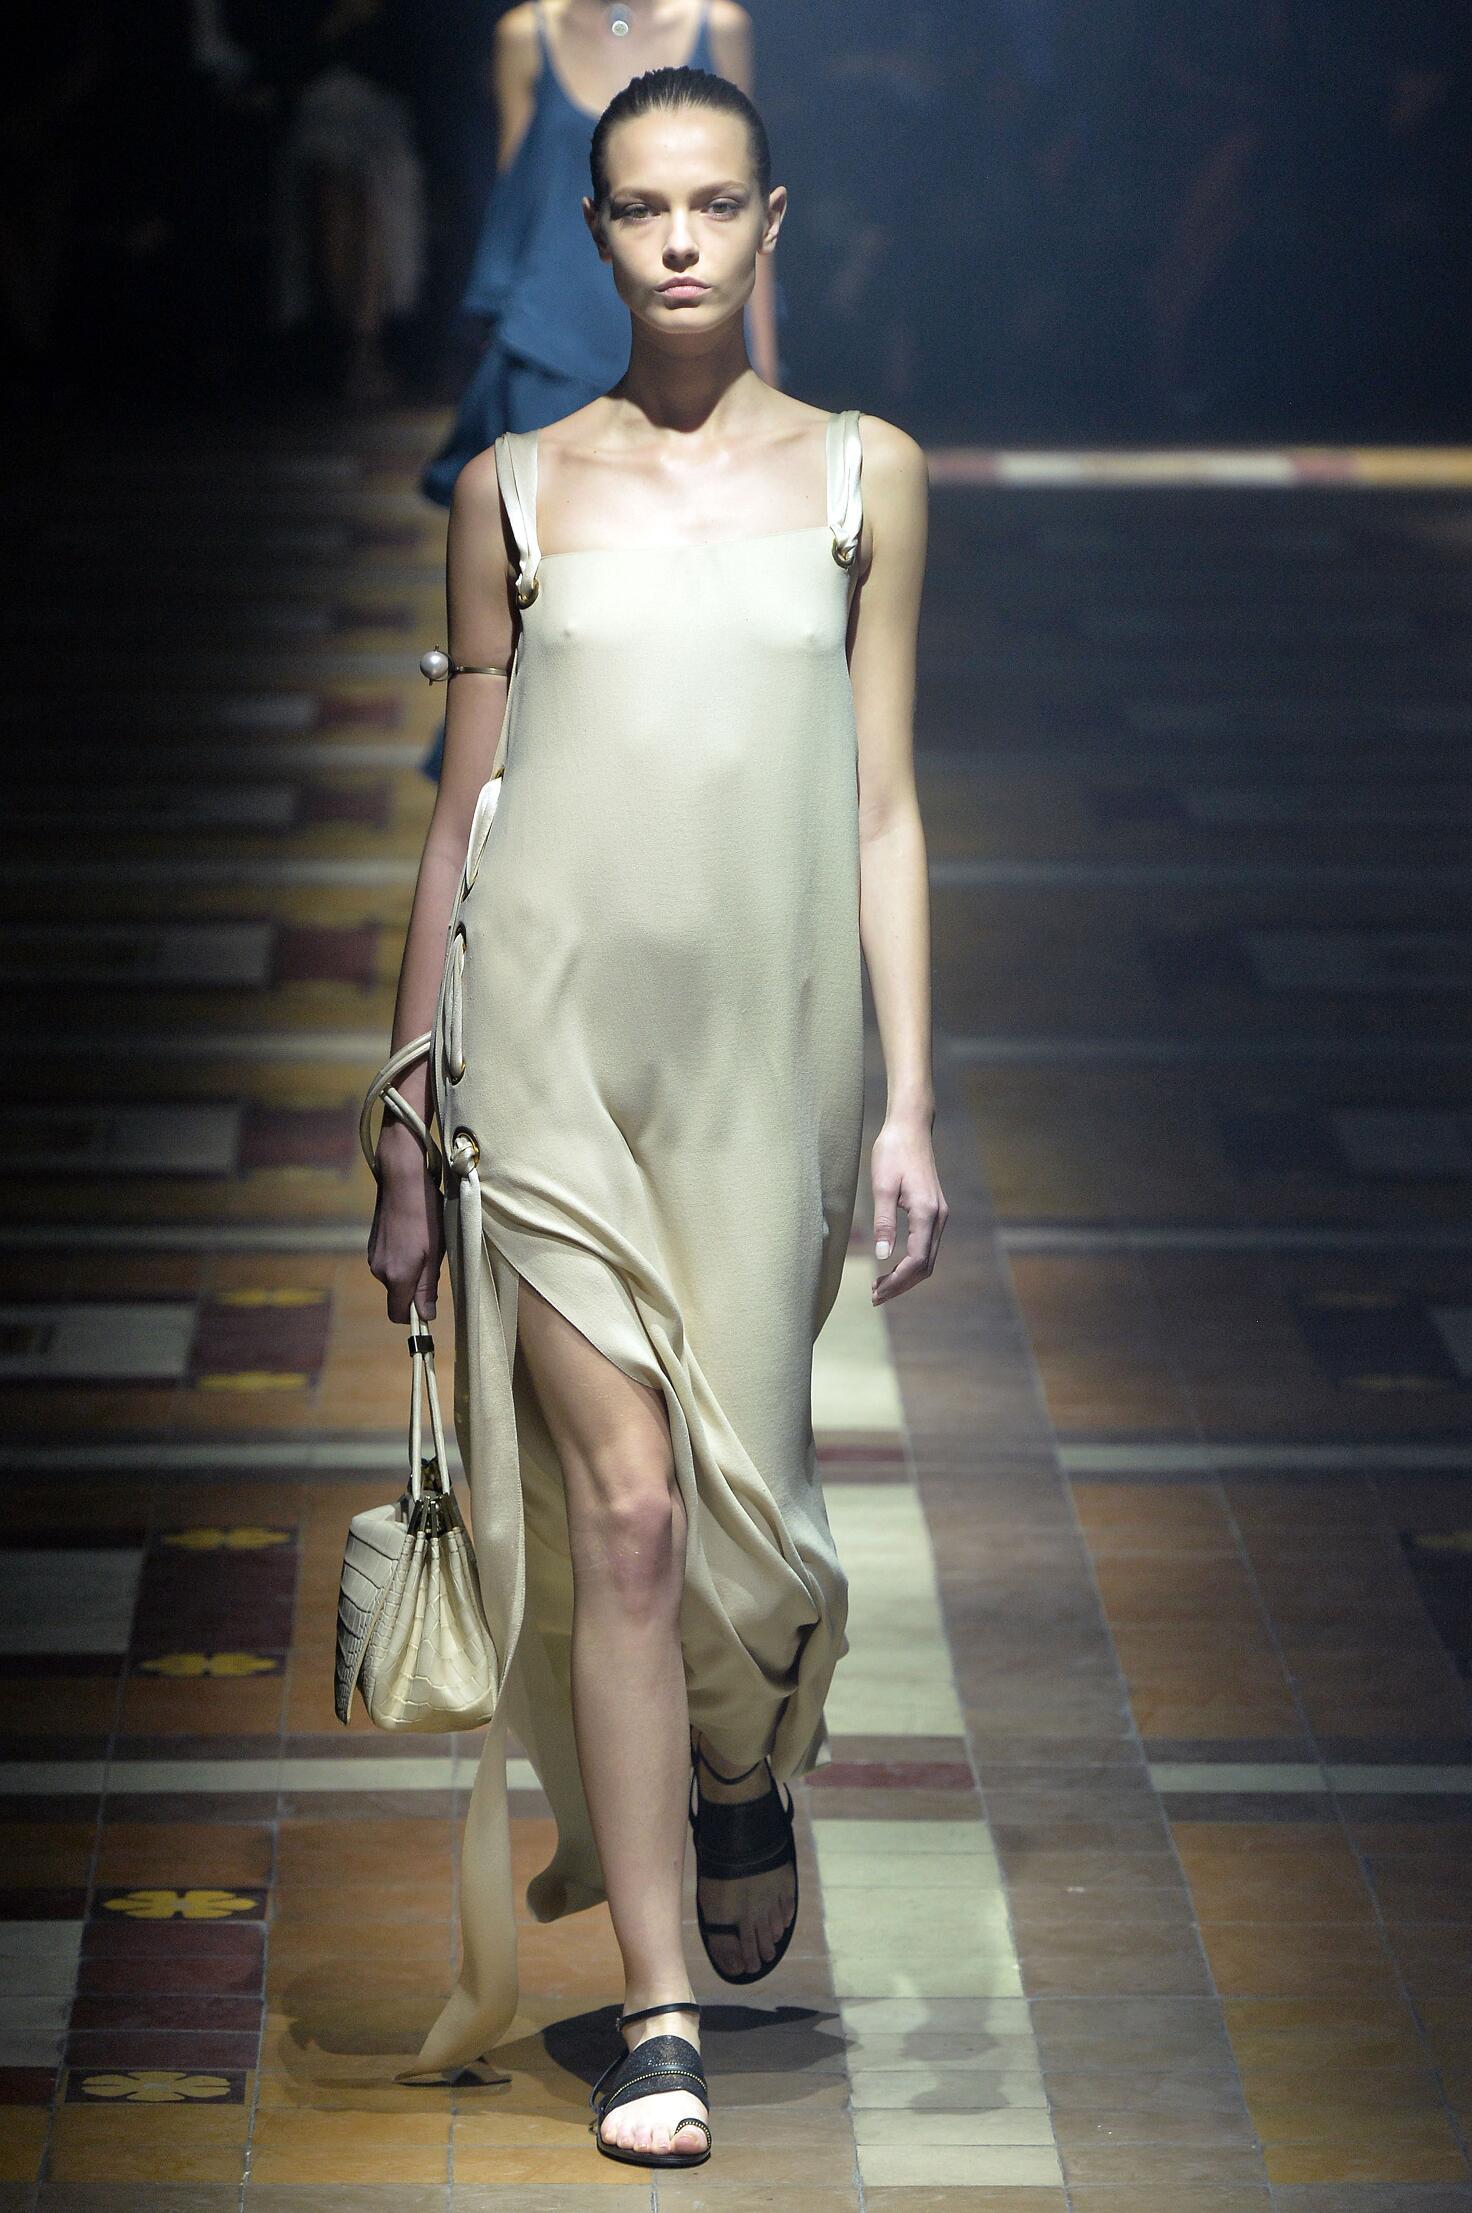 Summer Fashion Trends 2015 Lanvin